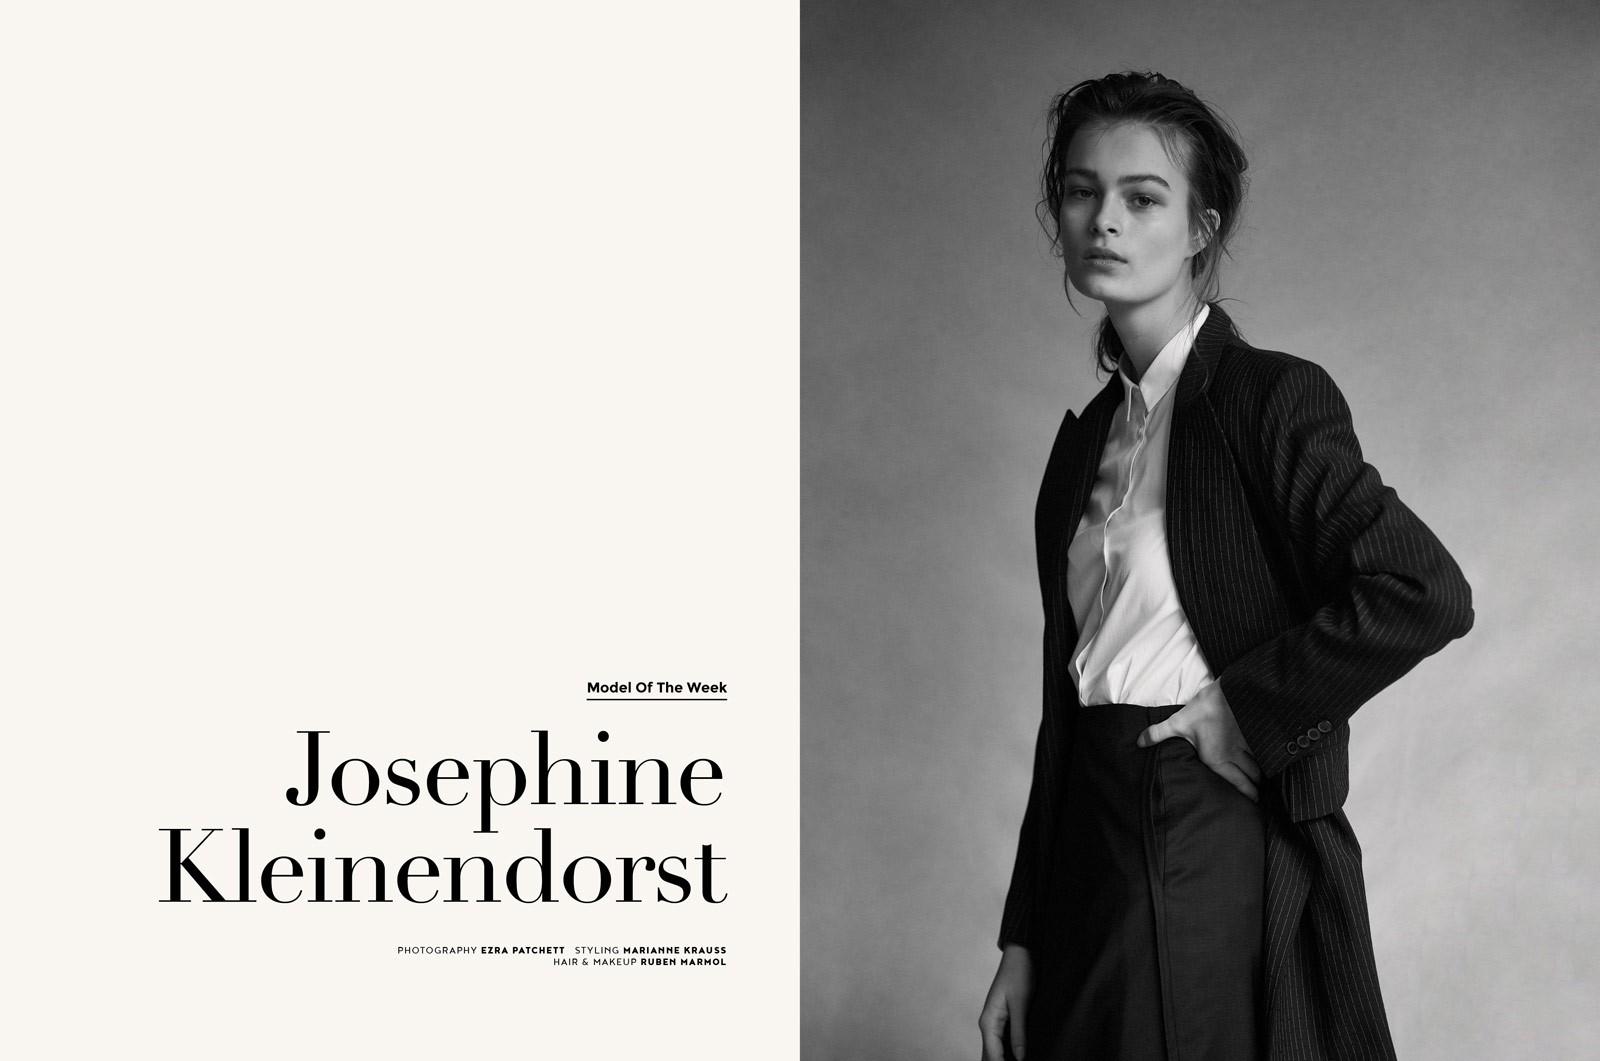 MOTW_JosephineKleinendorst_Viva_web-1600_01